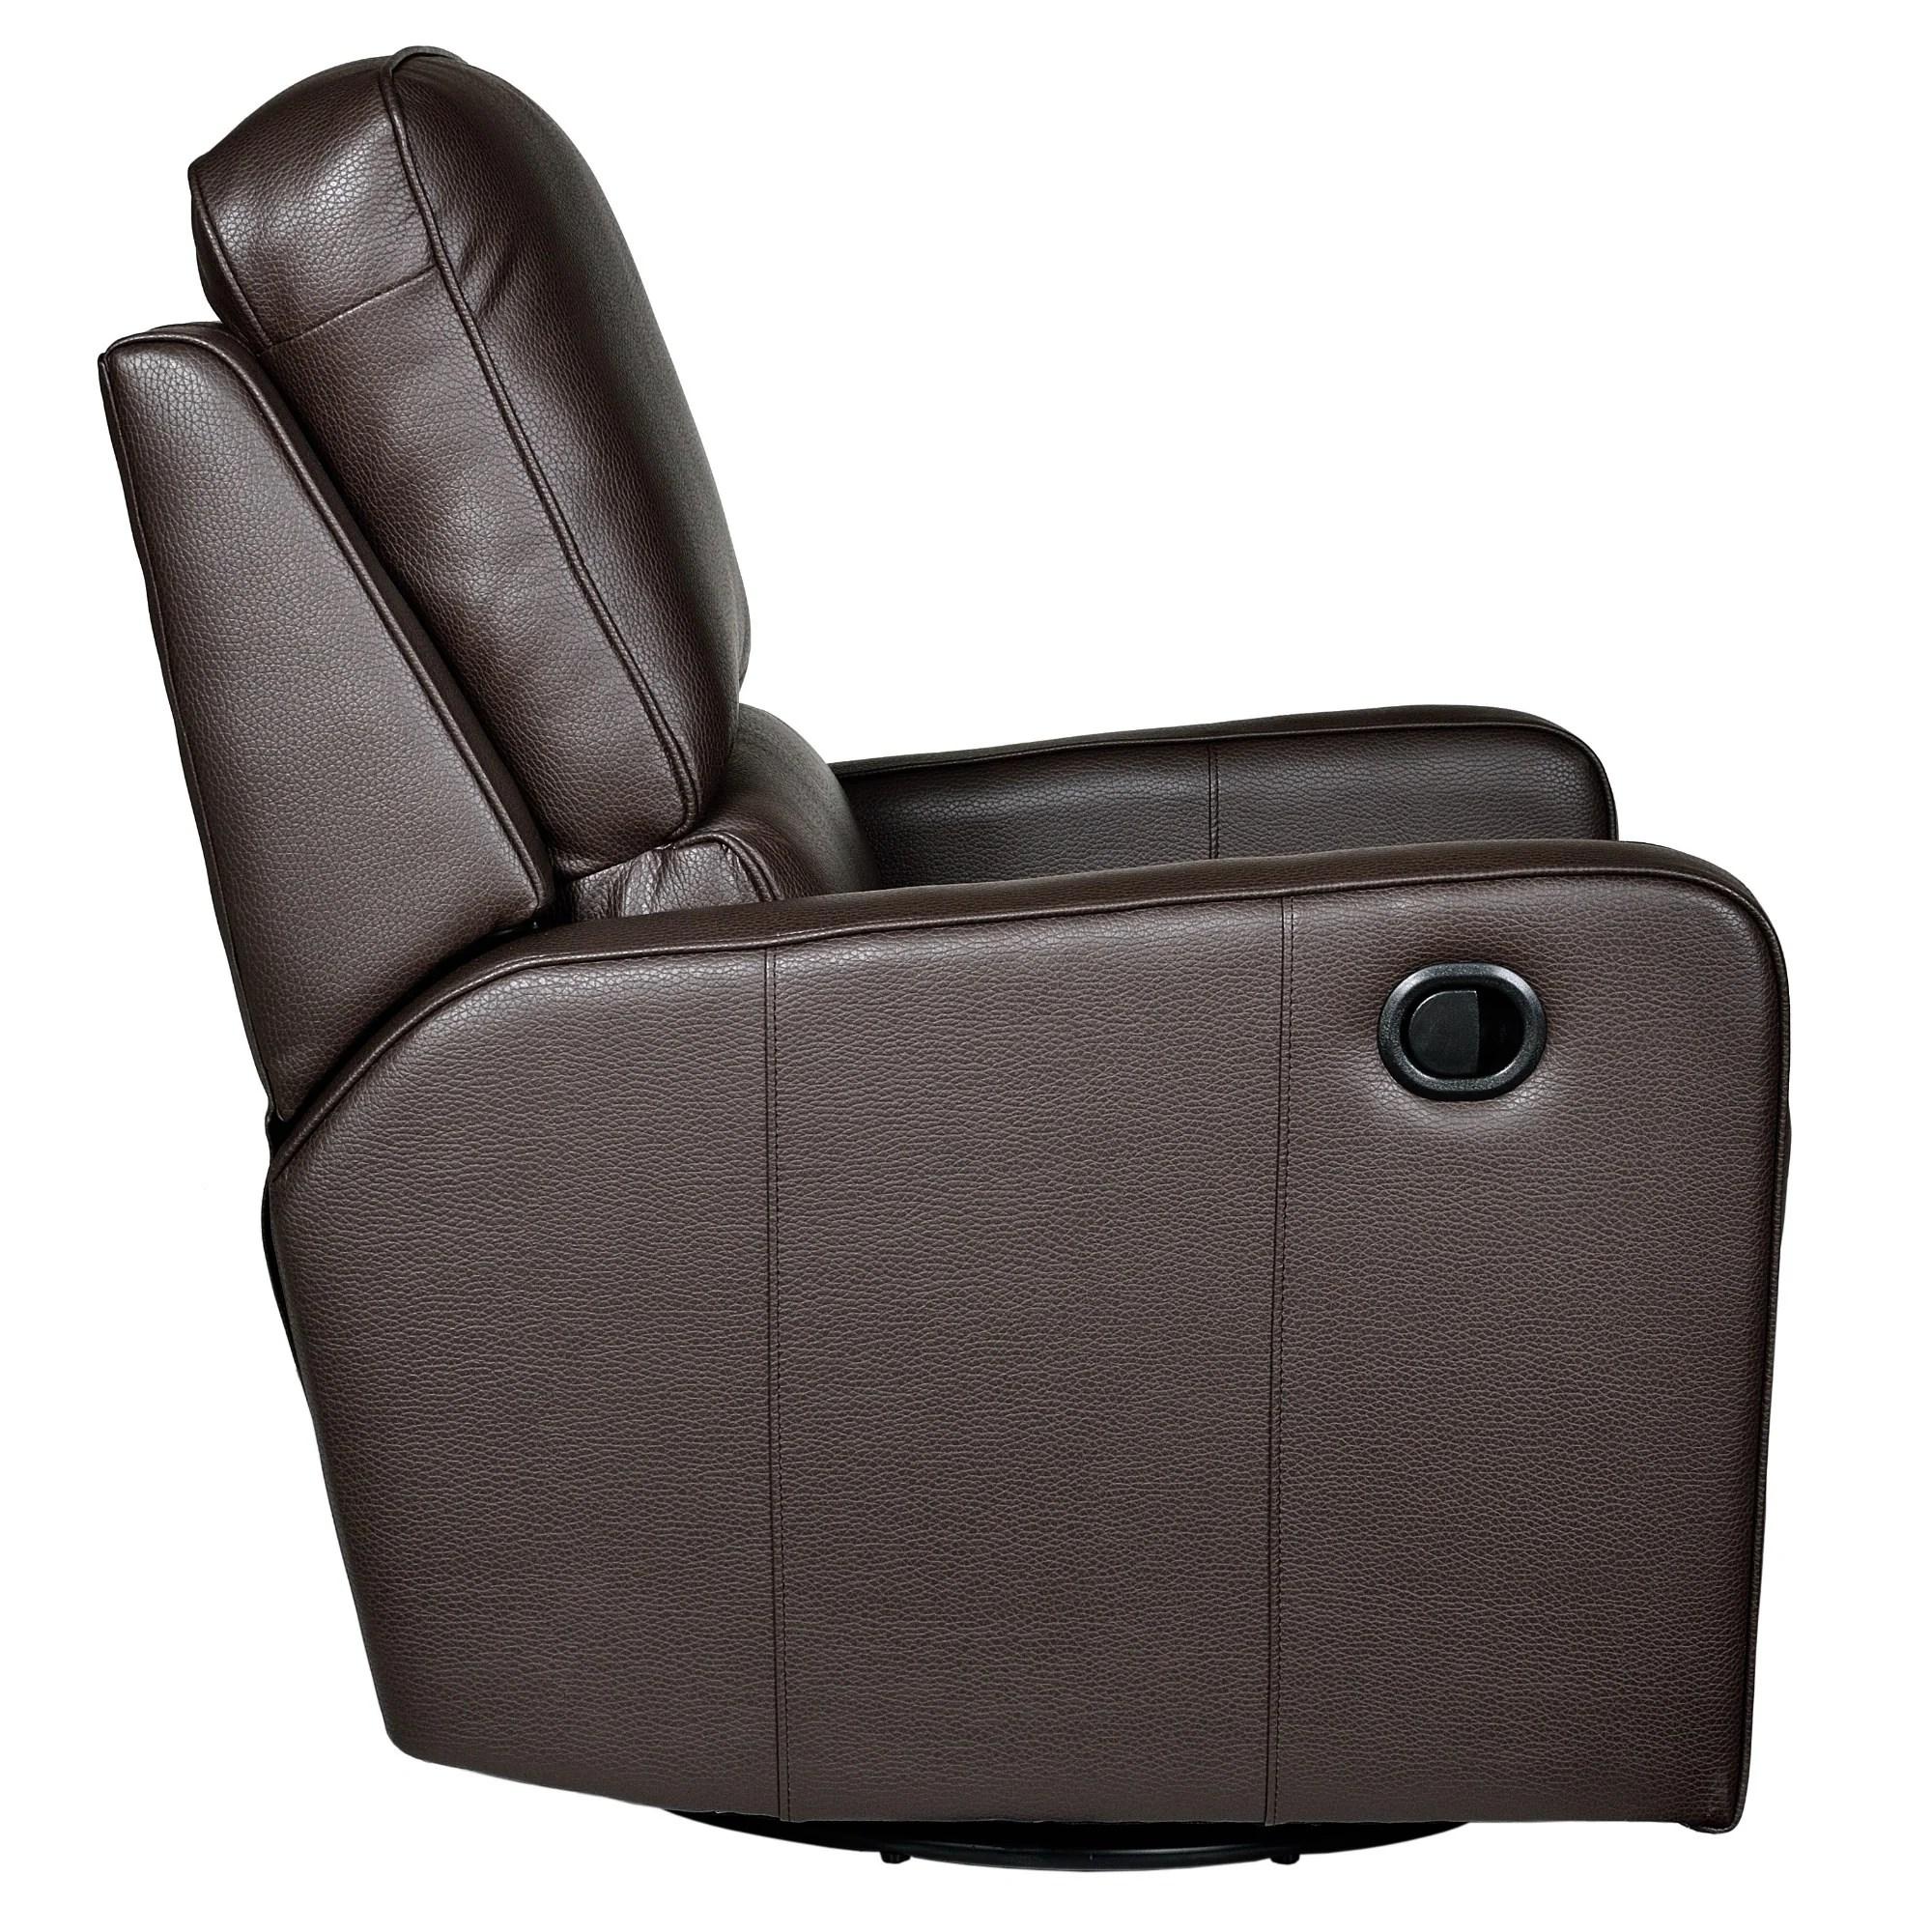 chaise sofas perth review ebay black leather sofa swivel rocker recliner - diego mocha – direct ...